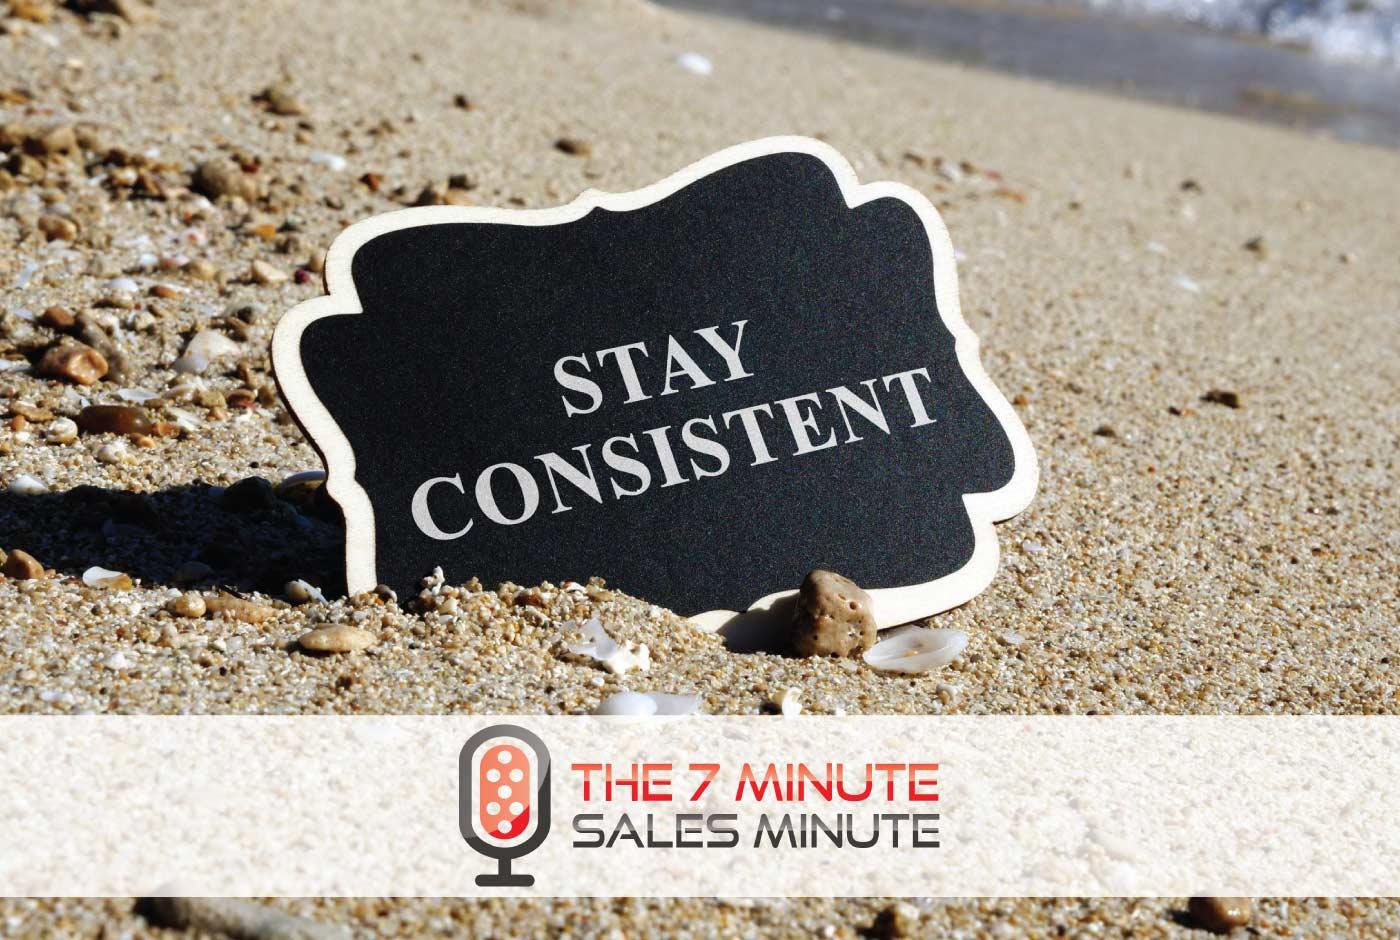 7 Minute Sales Minute Podcast - Season 12 - Episode 5 - A Formulaic Calculation